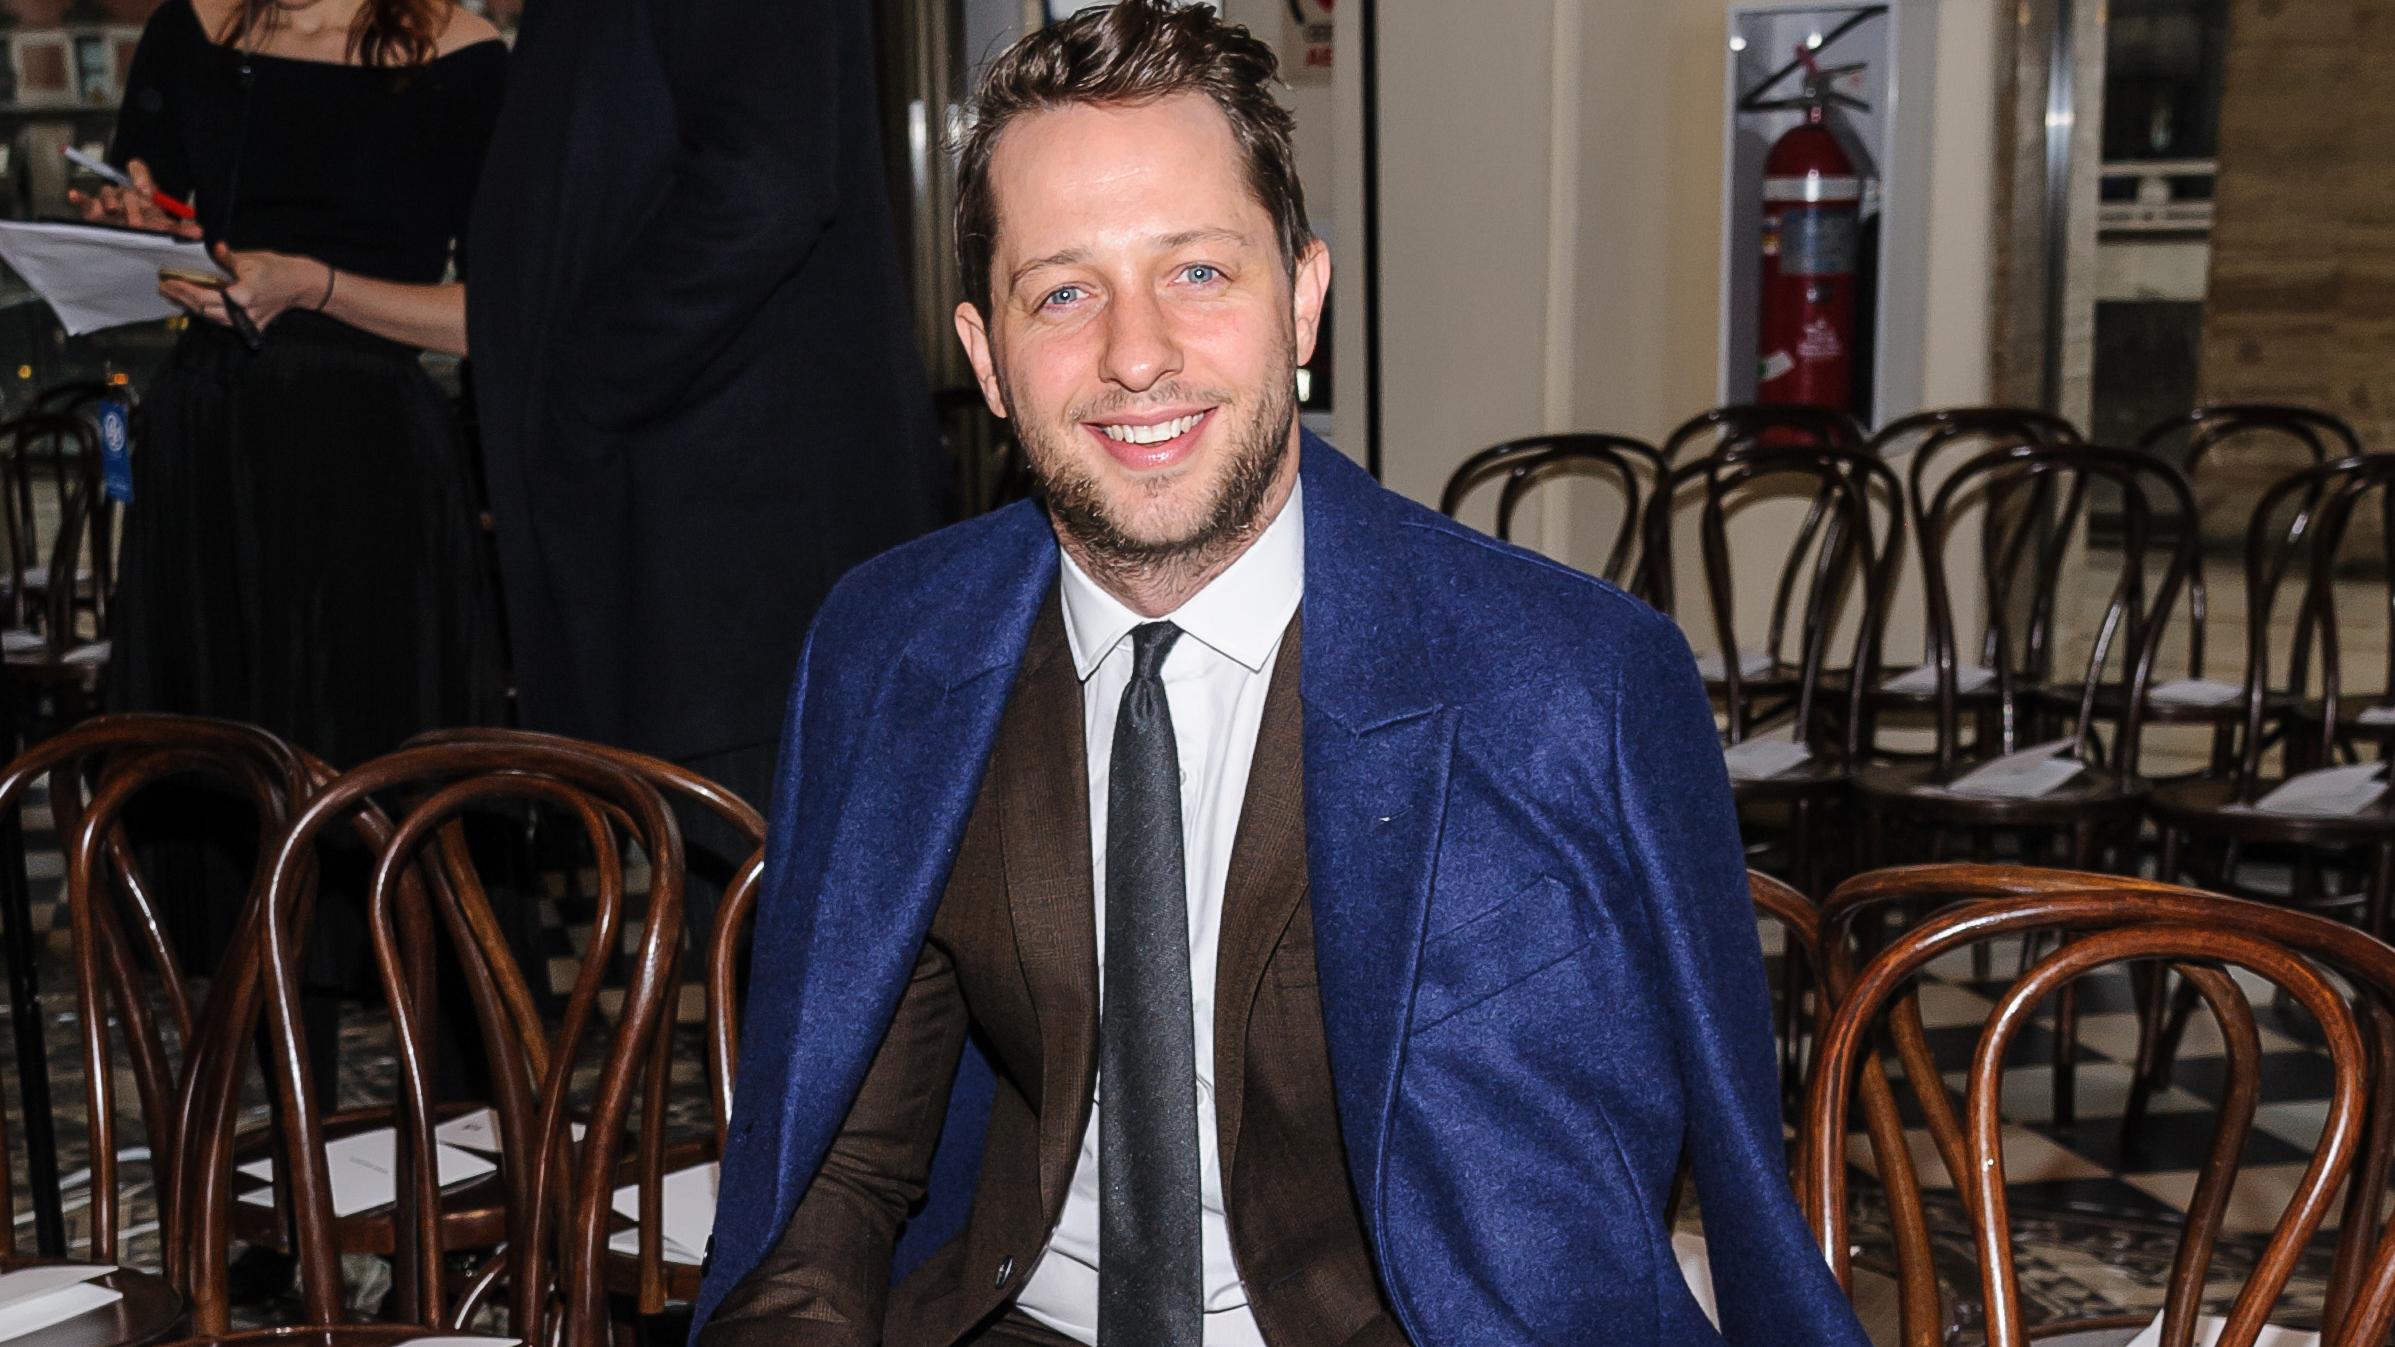 785880571452 Derek Blasberg attends the Tory Burch fashion show in David Geffen Hall at  New York Fashion Week Fall Winter 2016 on Tuesday